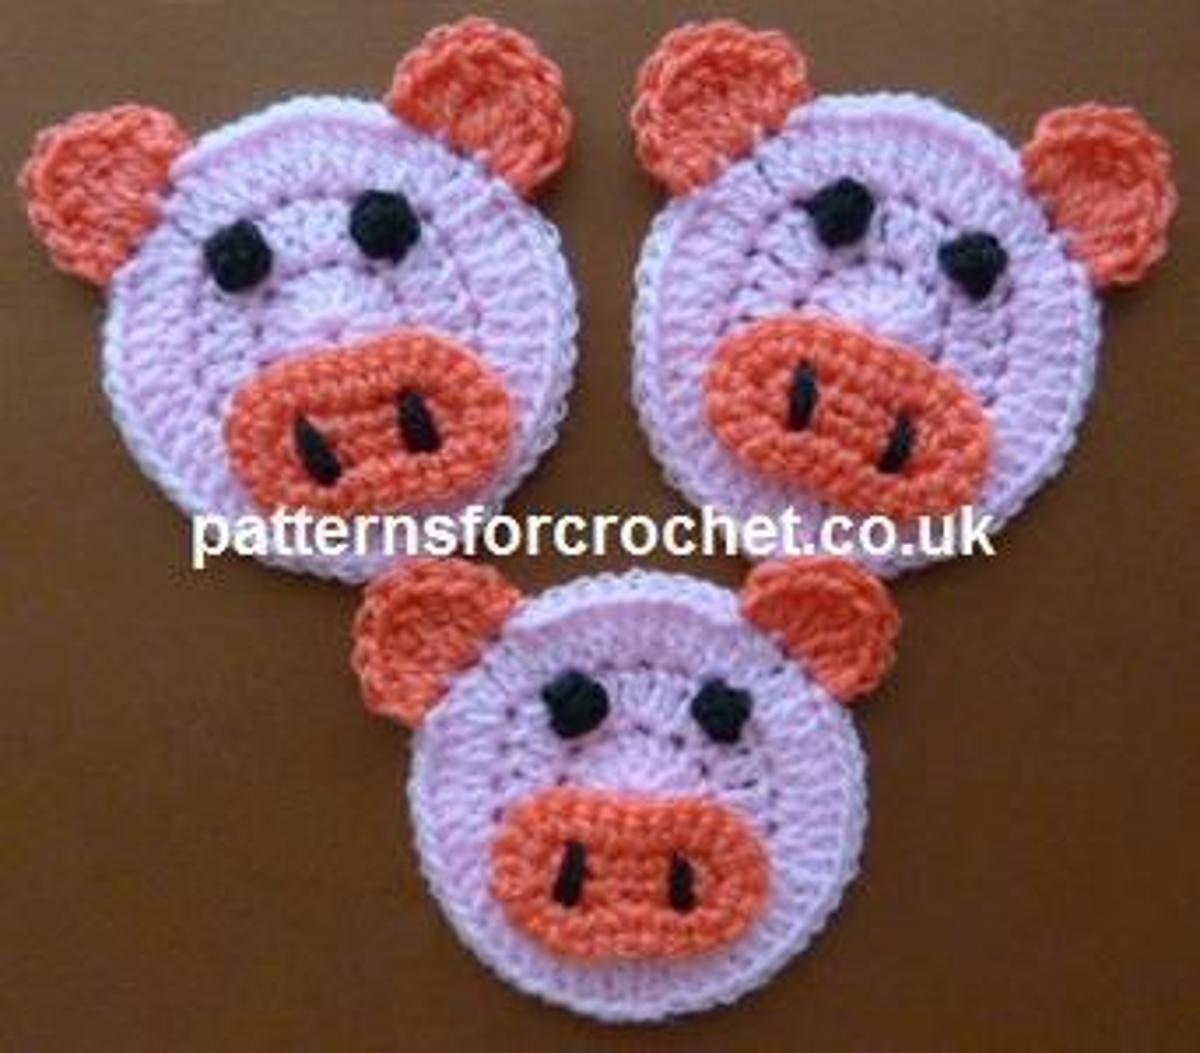 Pfc162 Piglet Applique Crochet Pattern Crochetknit Applique 3